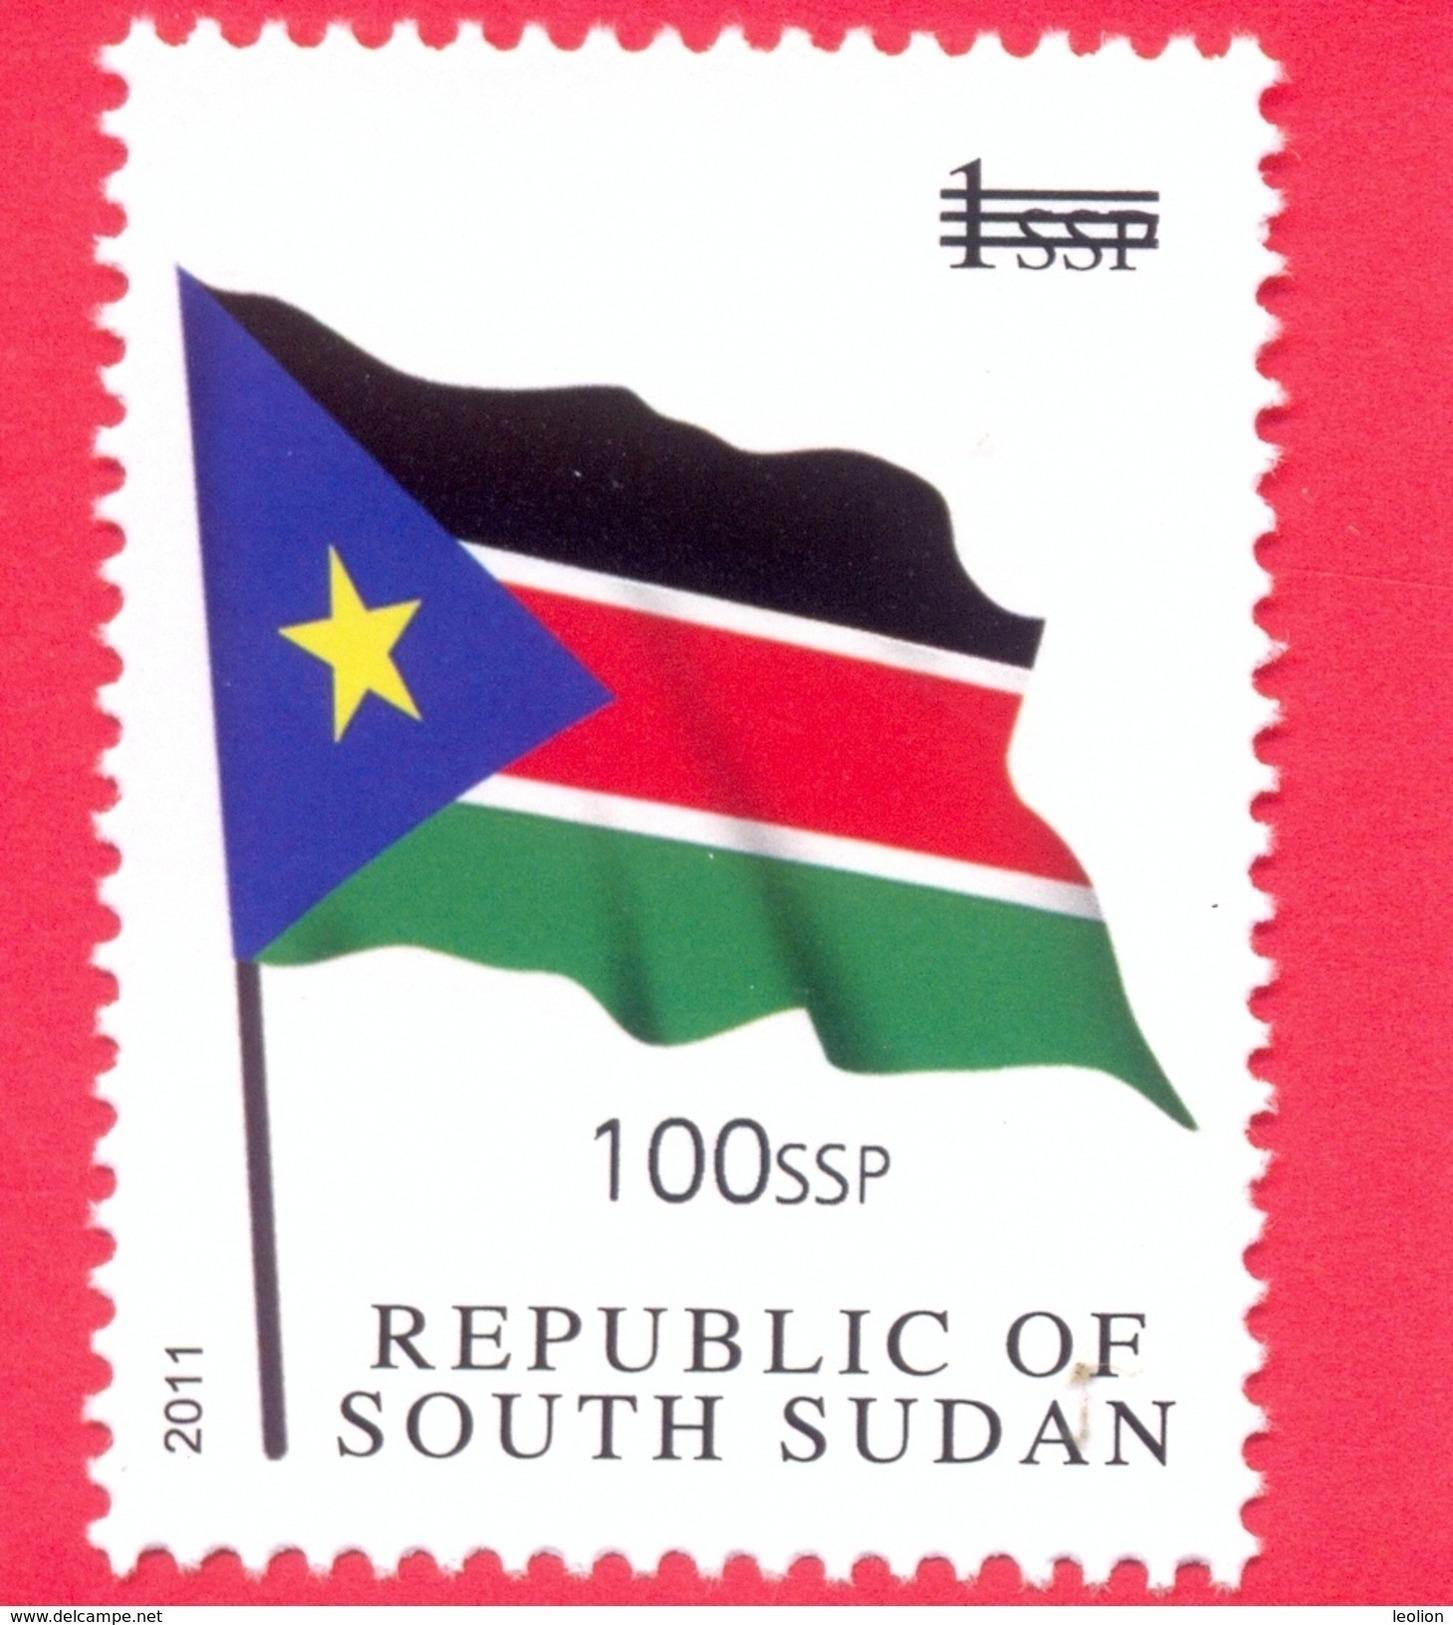 SOUTH SUDAN Surcharged Overprint 100 SSP (thin) On 1 SSP National Flag Stamp Of The 1st Set SOUDAN Du Sud Südsudan - Sud-Soudan